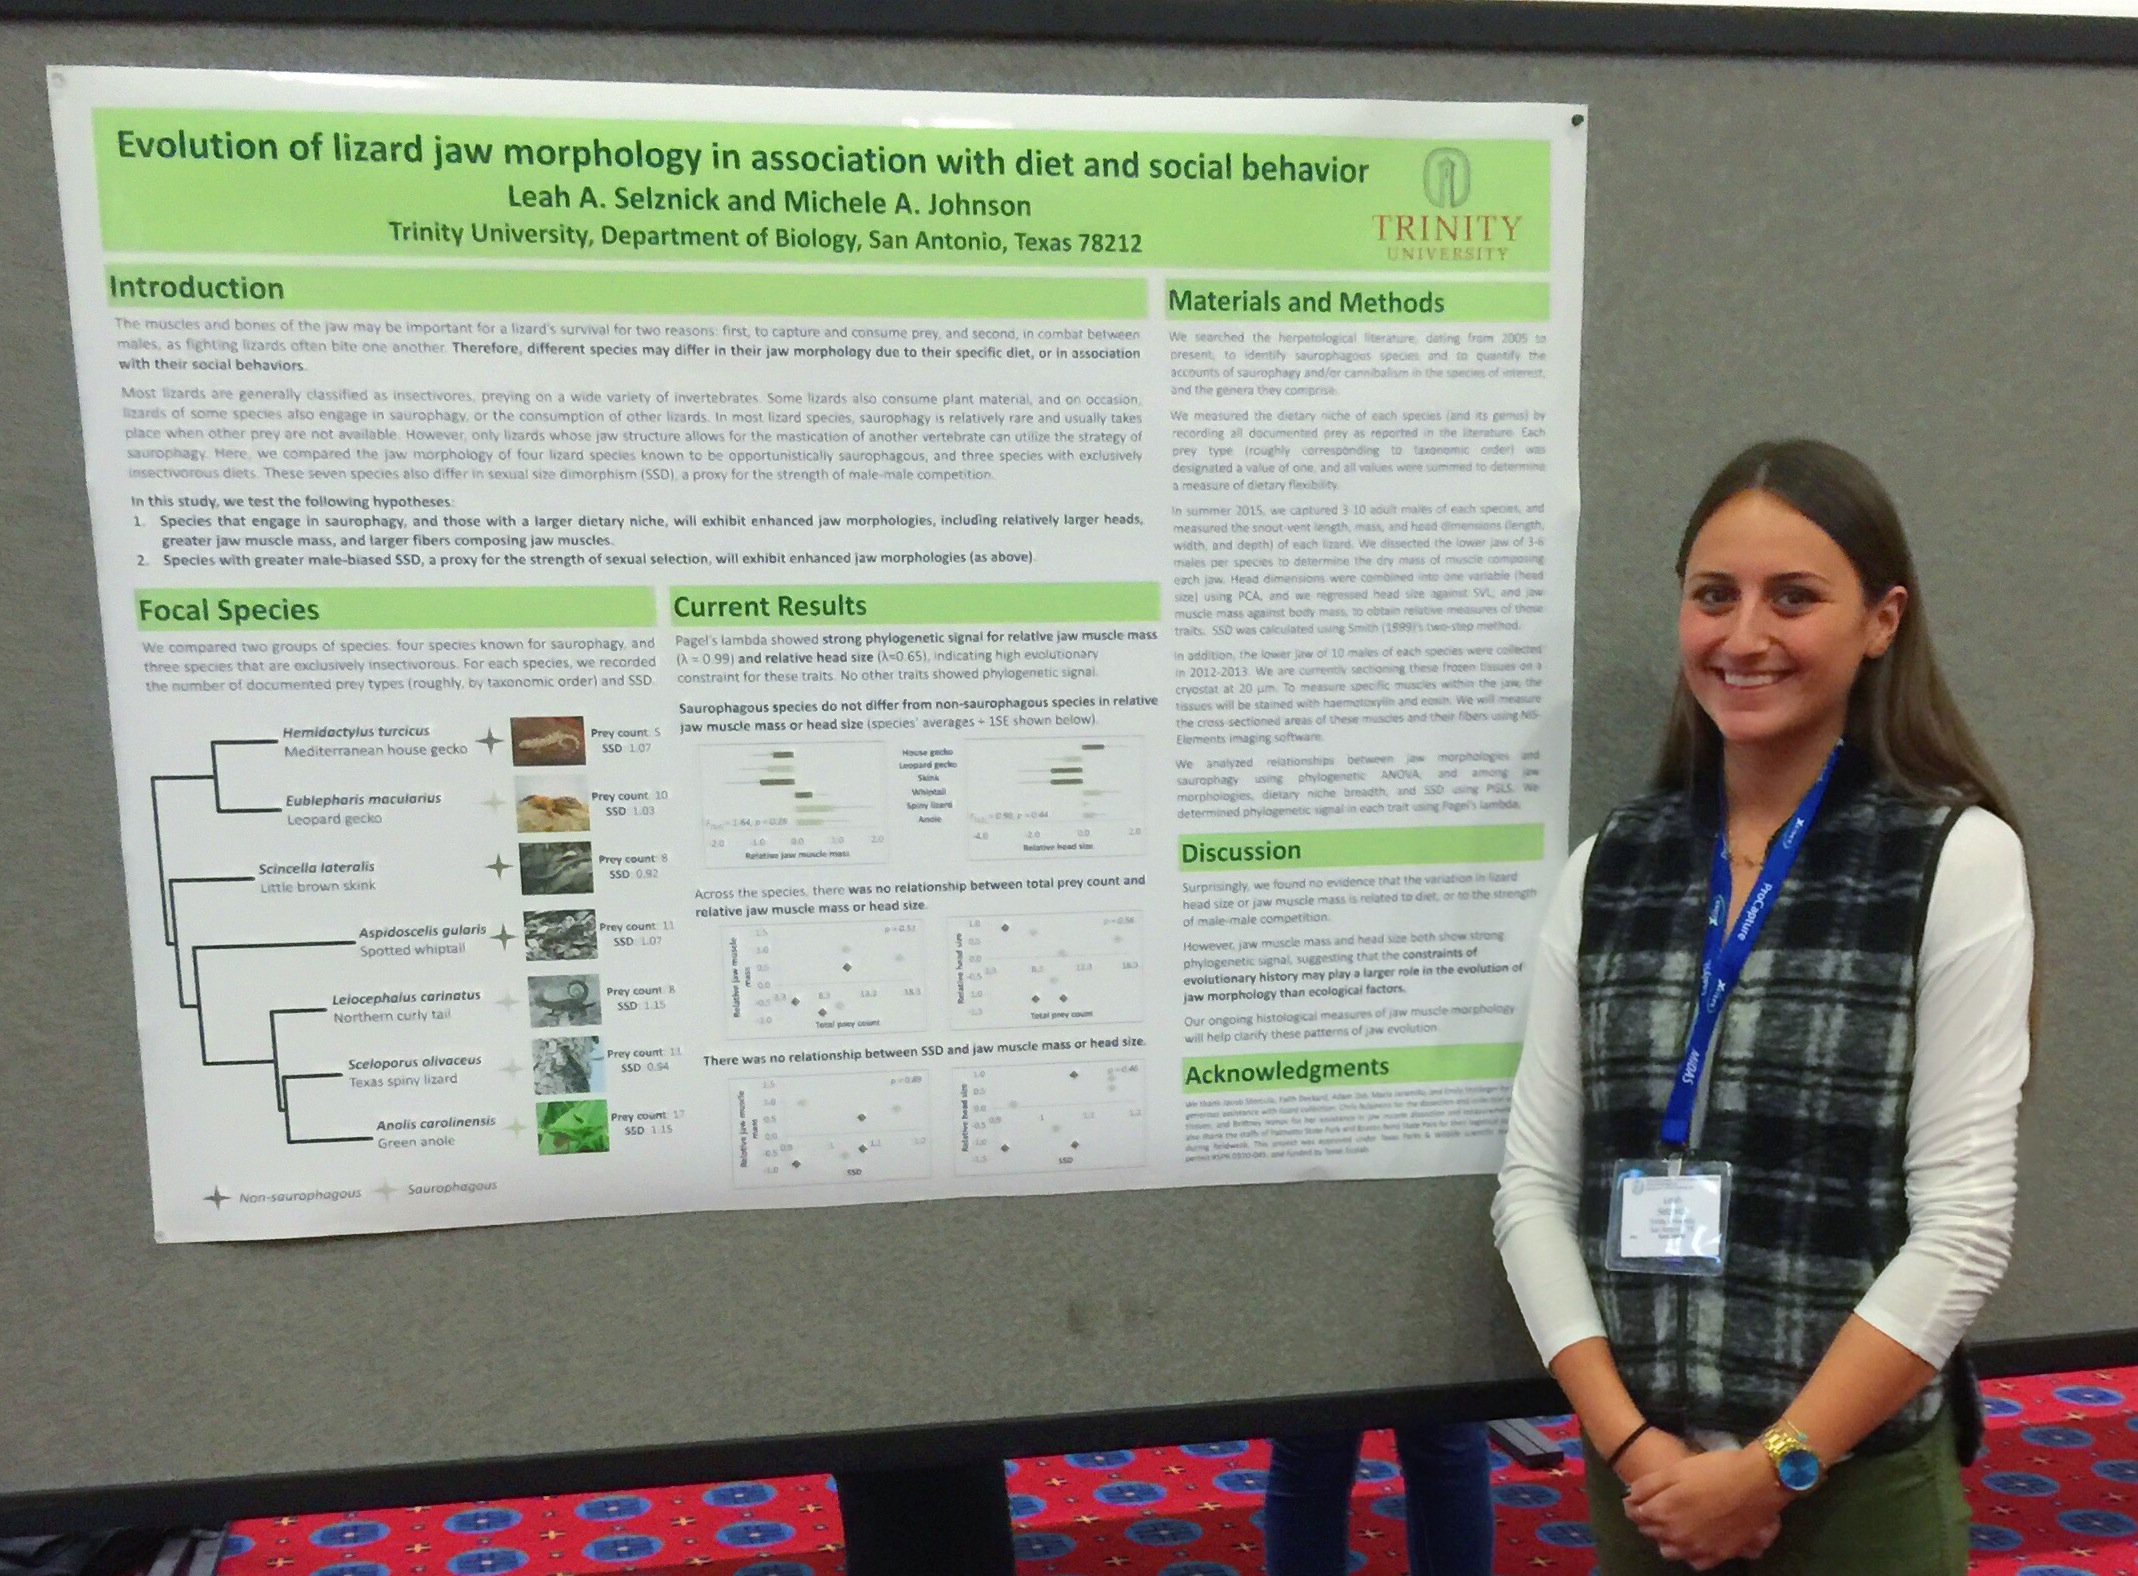 SICB 2016: Evolution of Lizard Jaw Morphology in Association